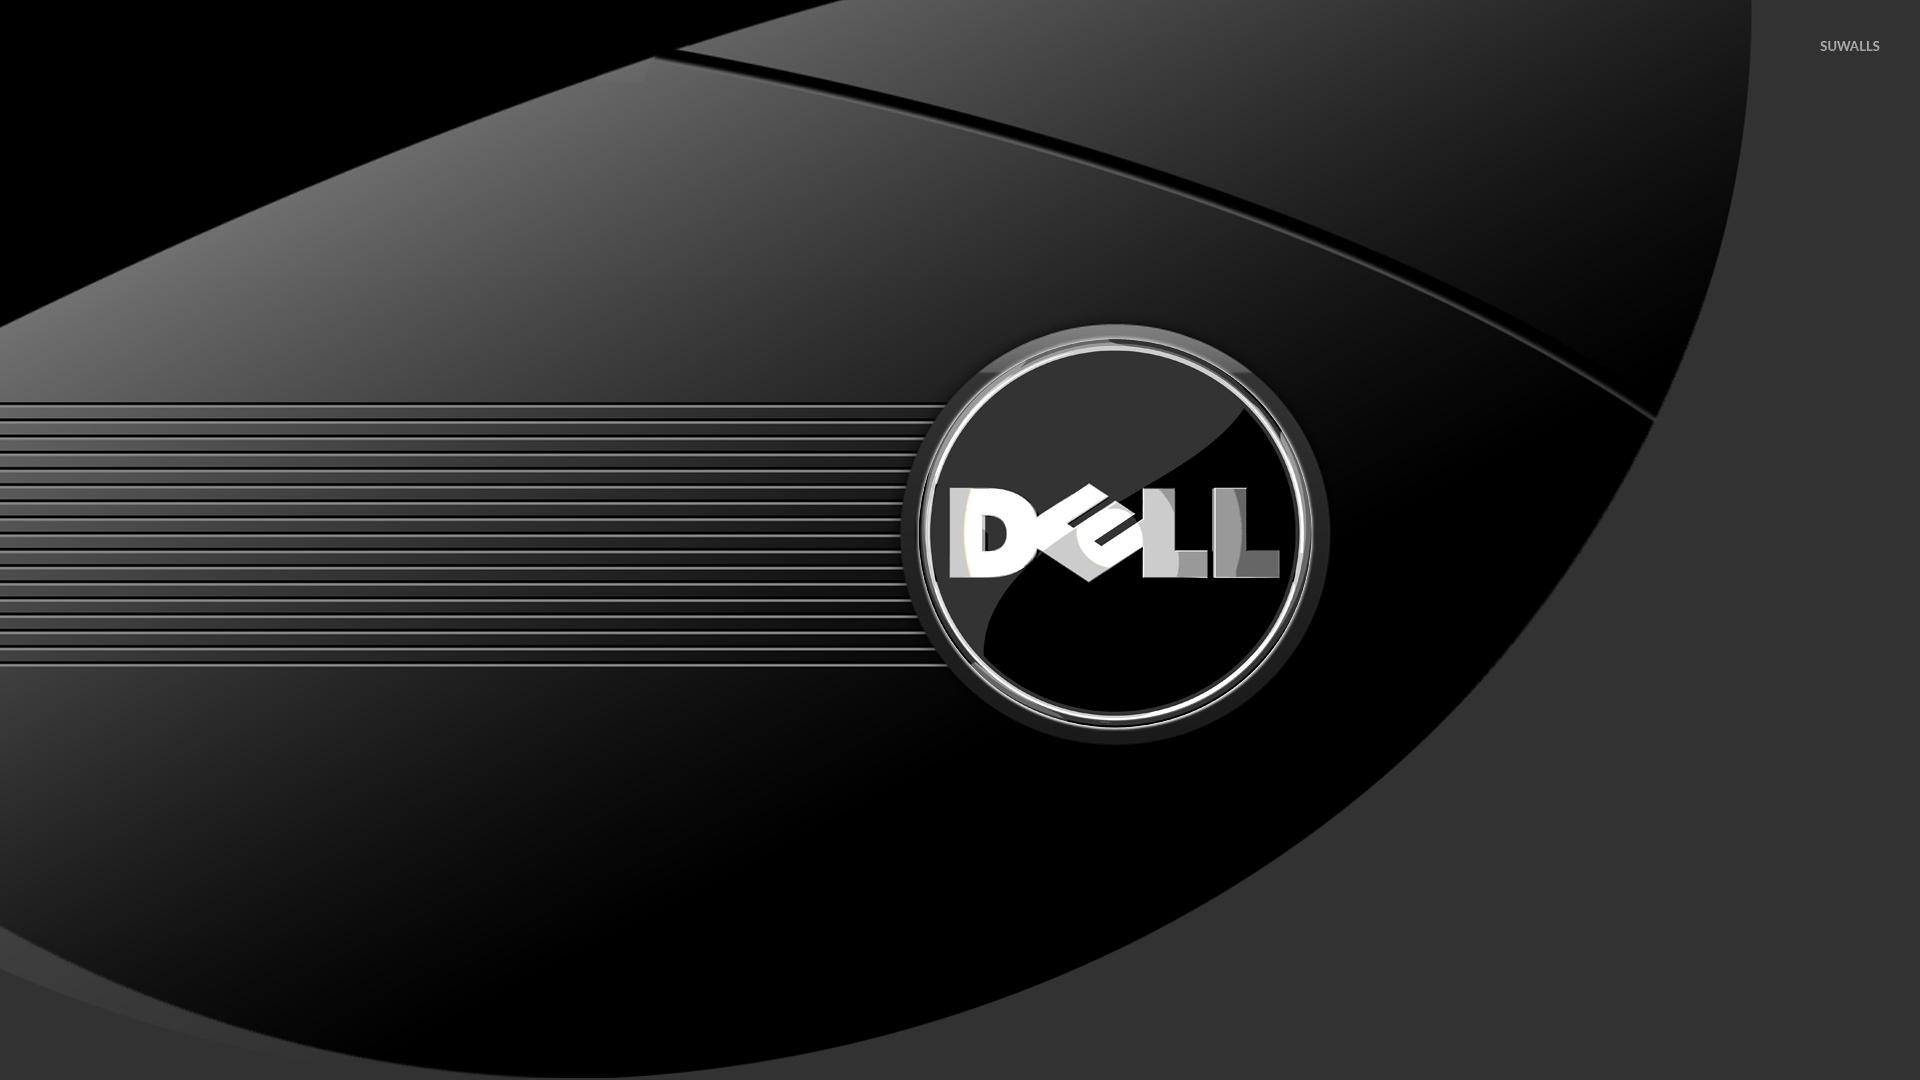 49 Dell Laptop Wallpaper 1366x768 On Wallpapersafari